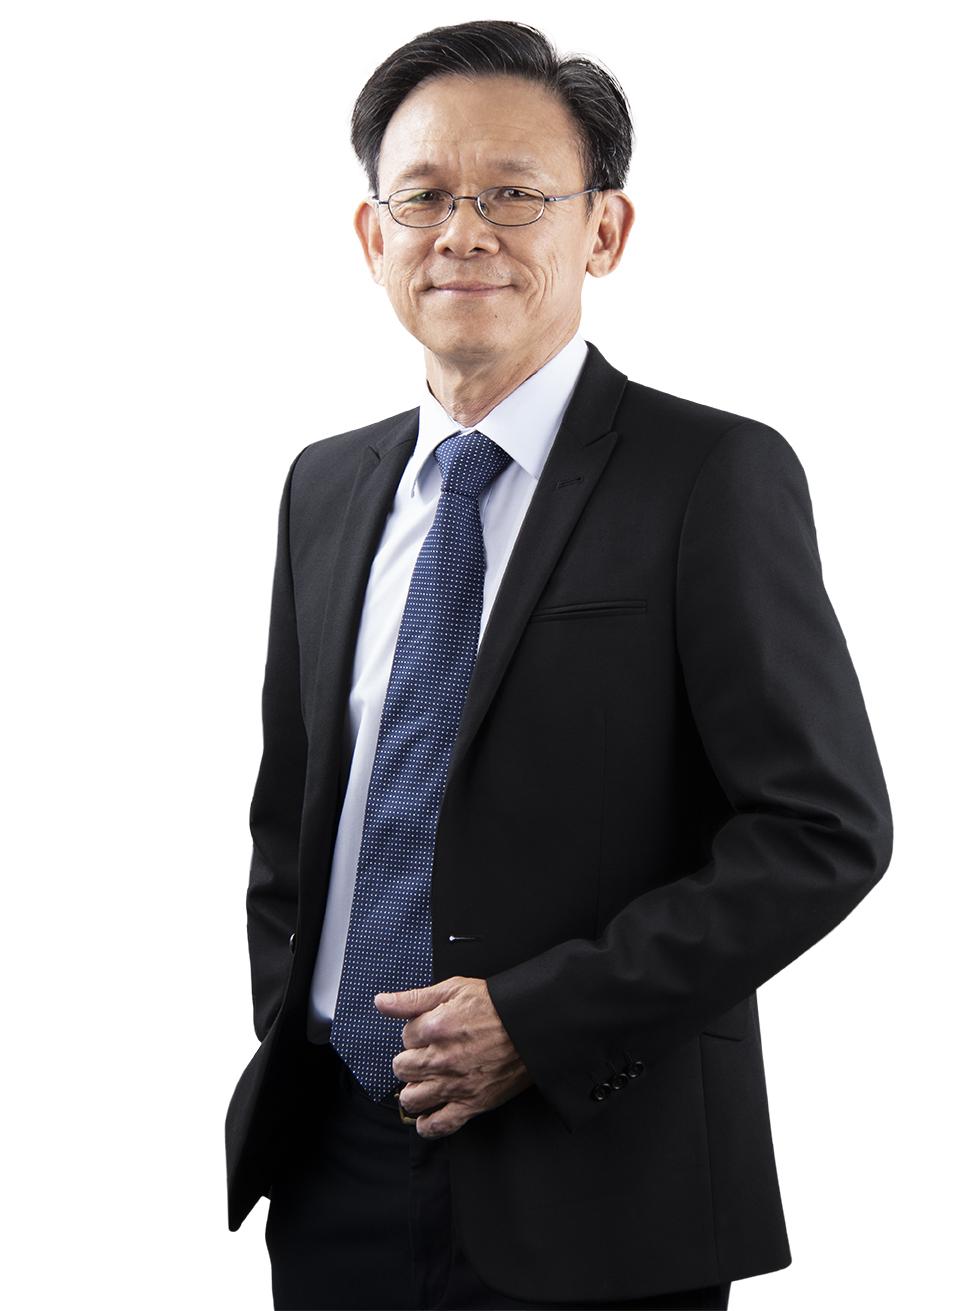 Mr. Wah Teng Gan - Synesys Group COO